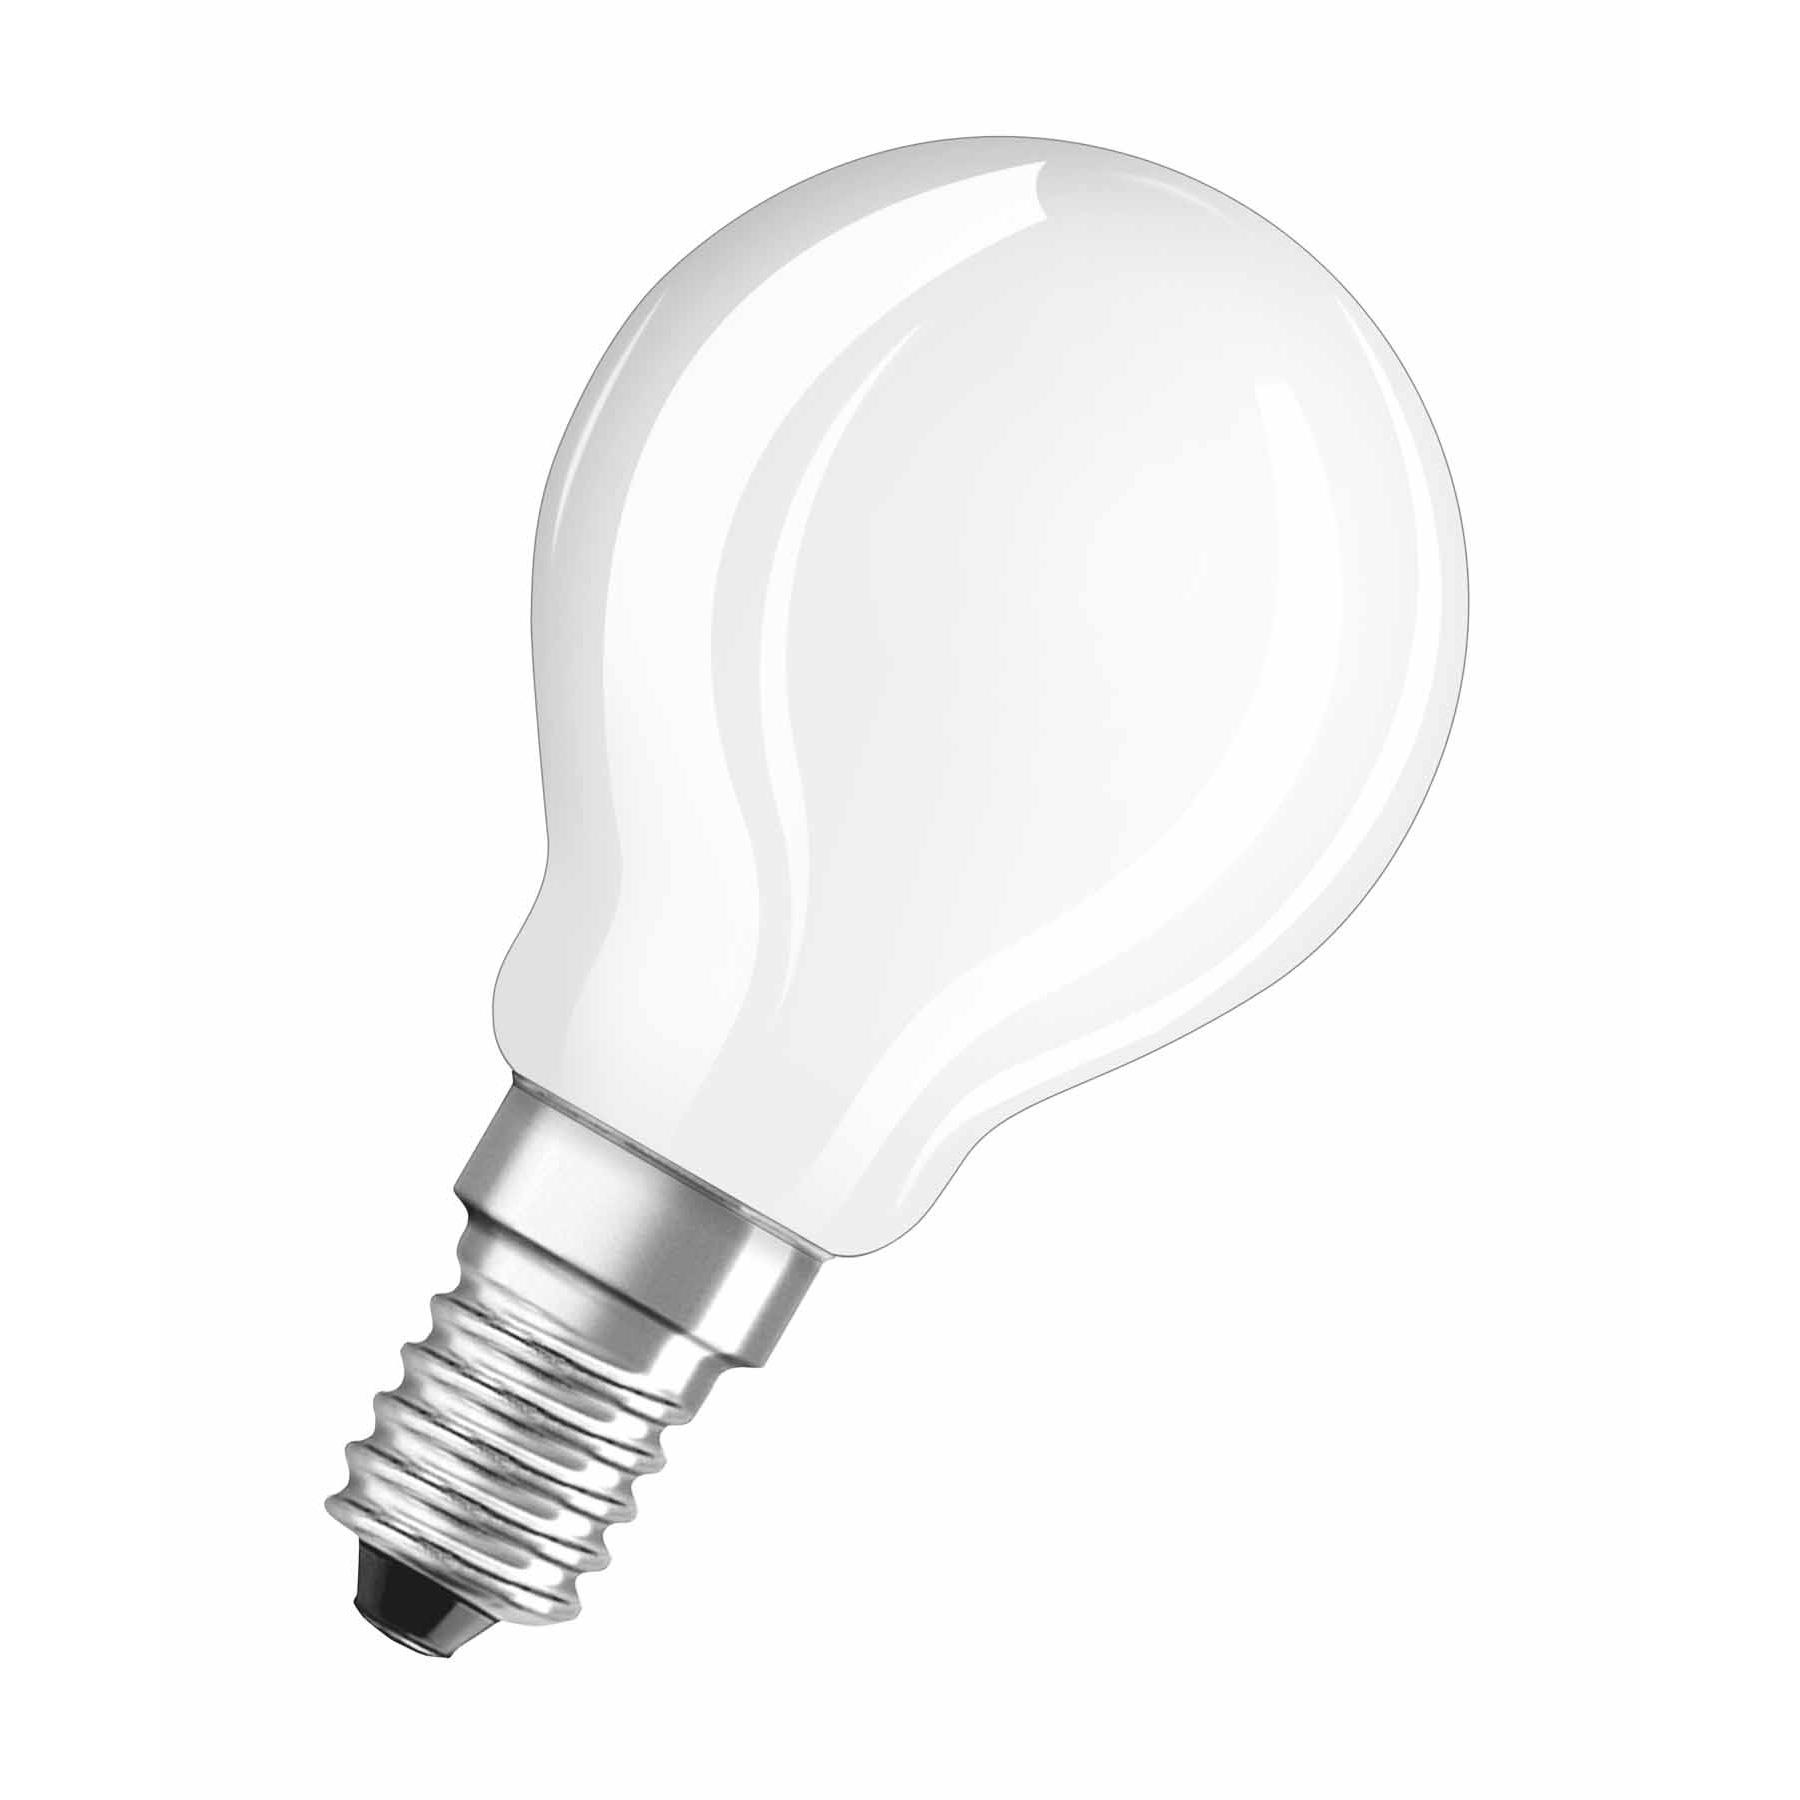 Led Lampen: Osram Led Lampen Test